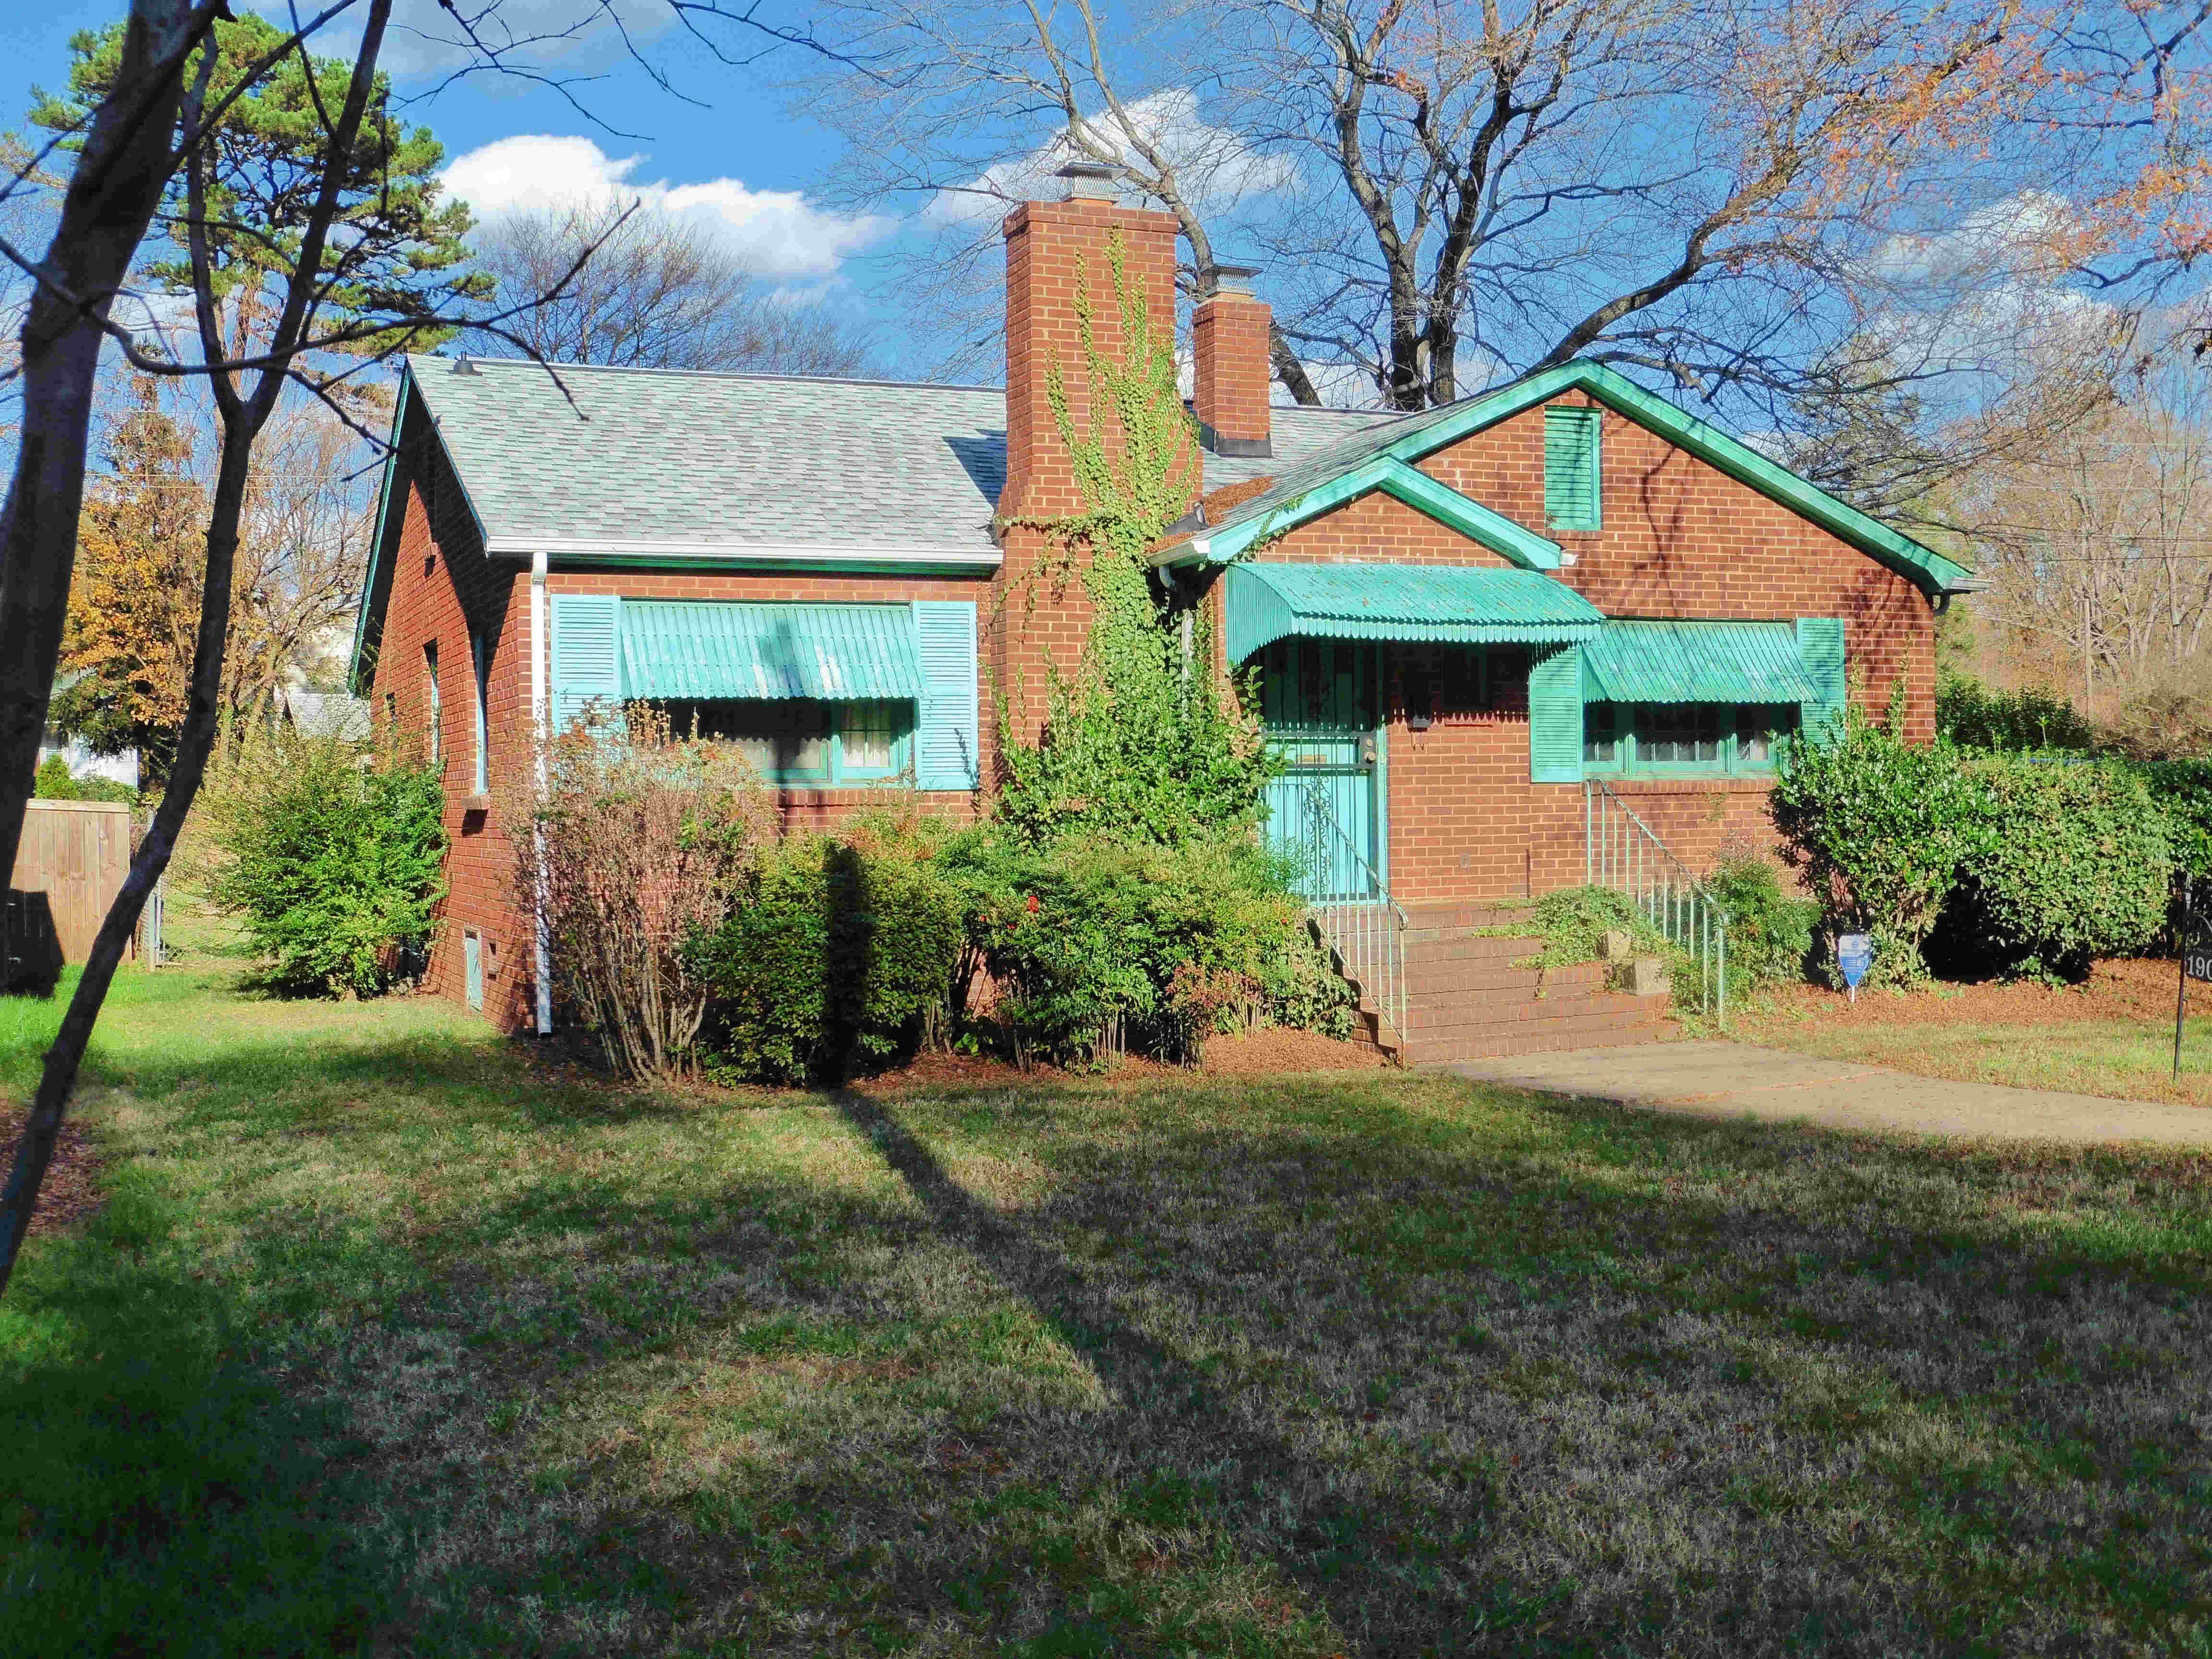 1900 Patton Avenue - McCrorey Heights